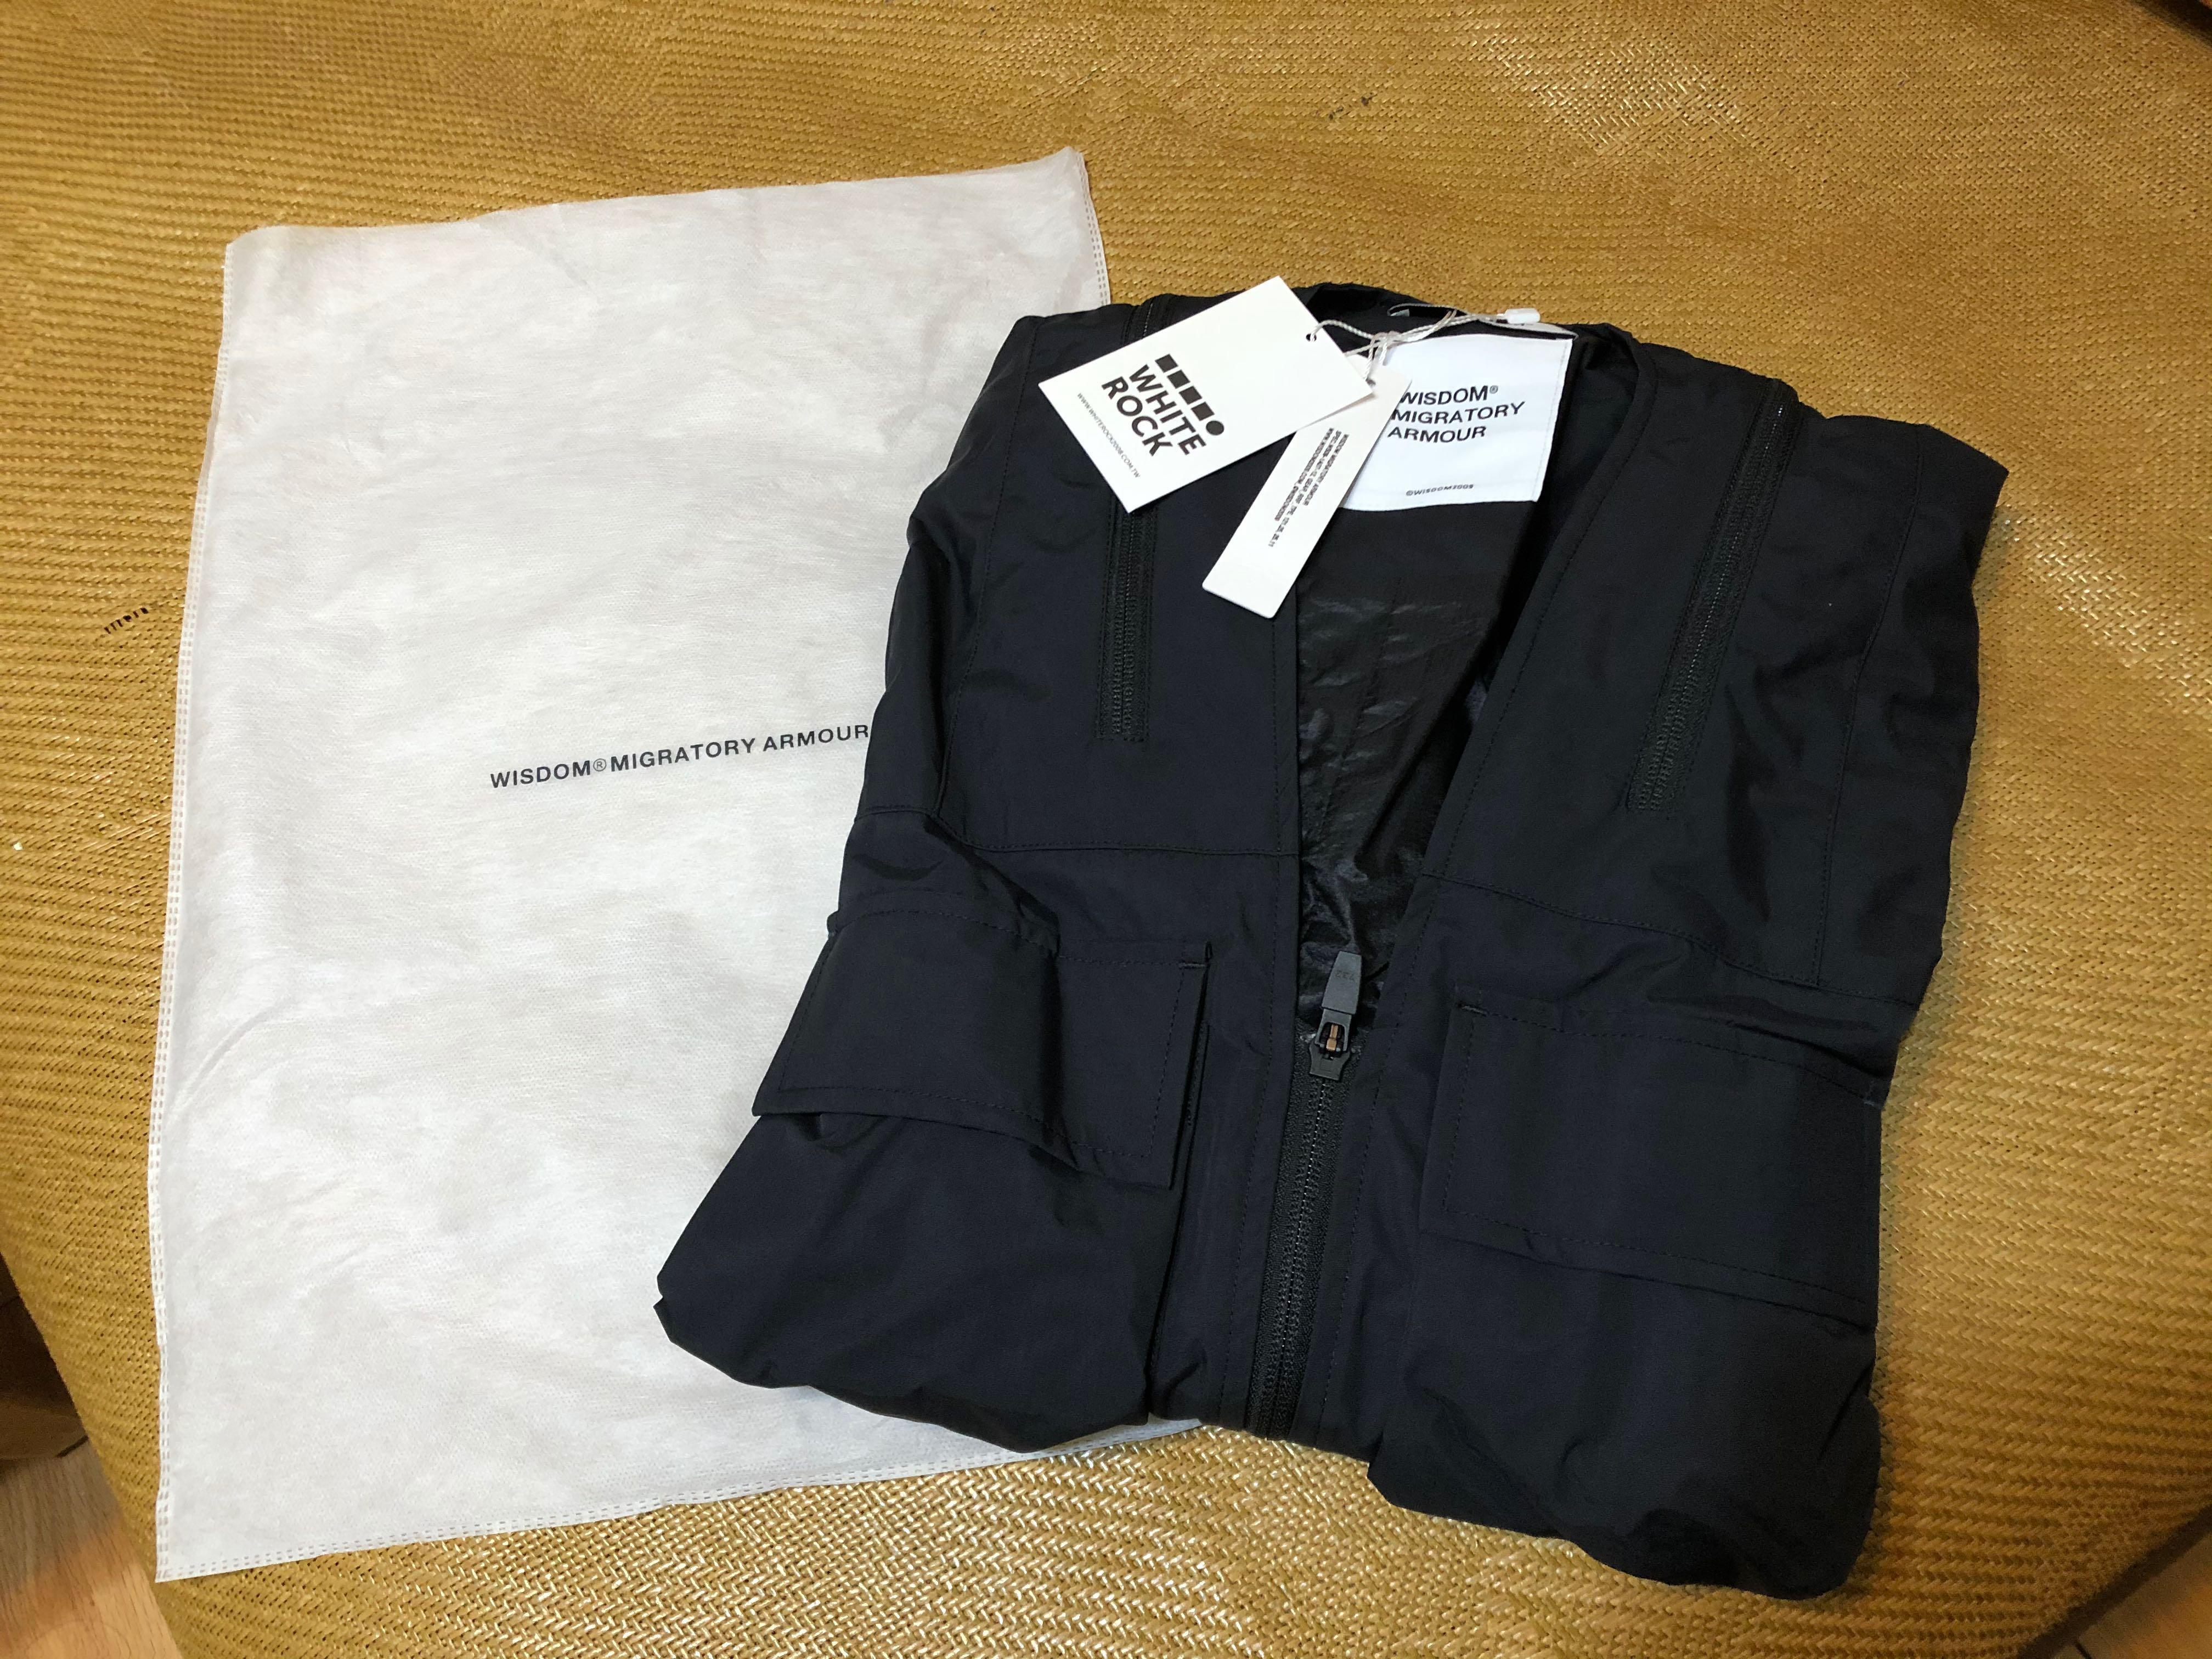 Wisdom Multi-zip Jacket 外套 軍裝 黑 多層次